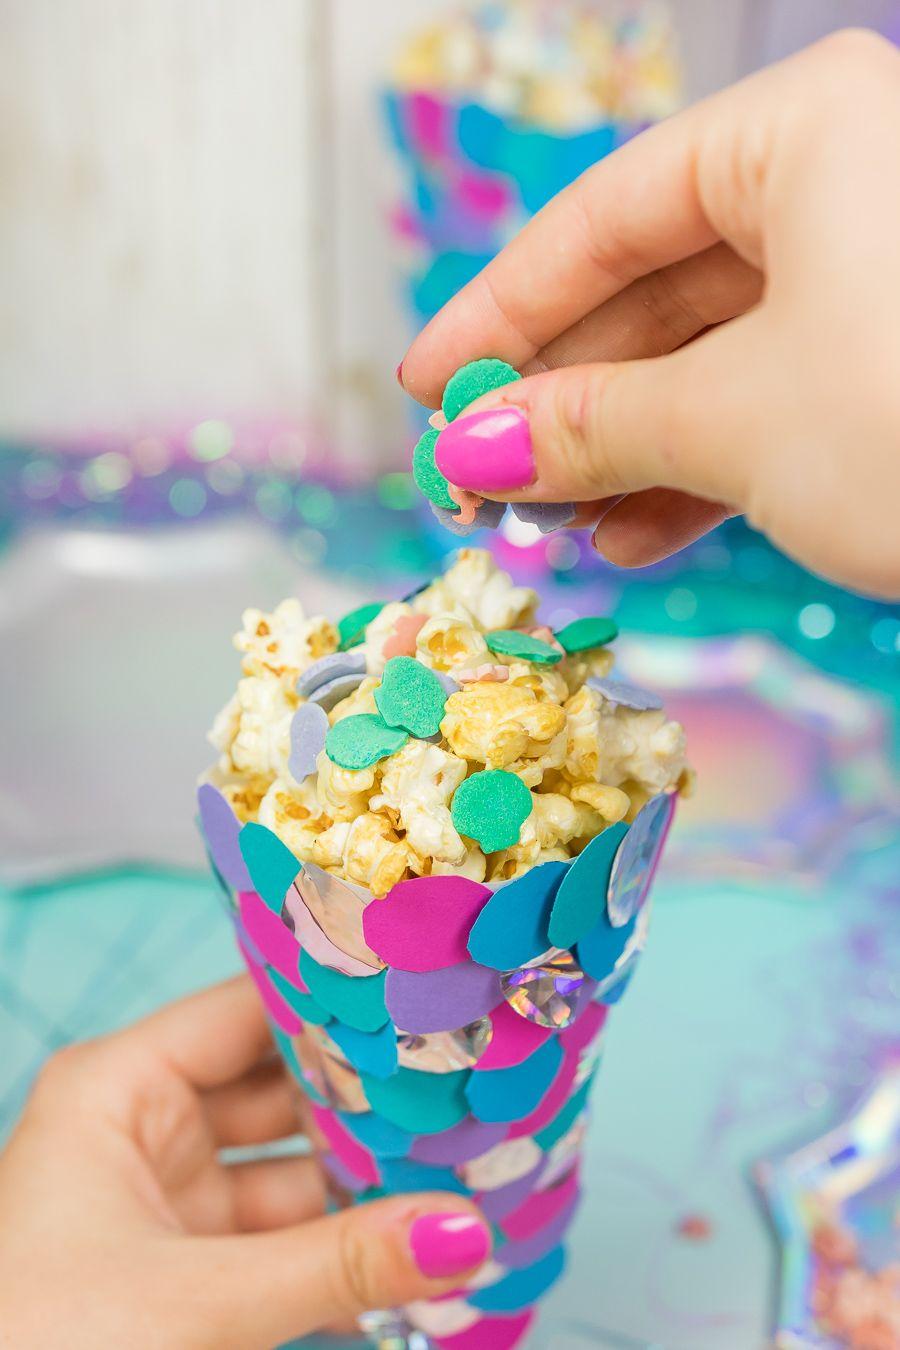 meerjungfrauen party diy ideen popcornt ten selber machen diy basteln selbermachen. Black Bedroom Furniture Sets. Home Design Ideas